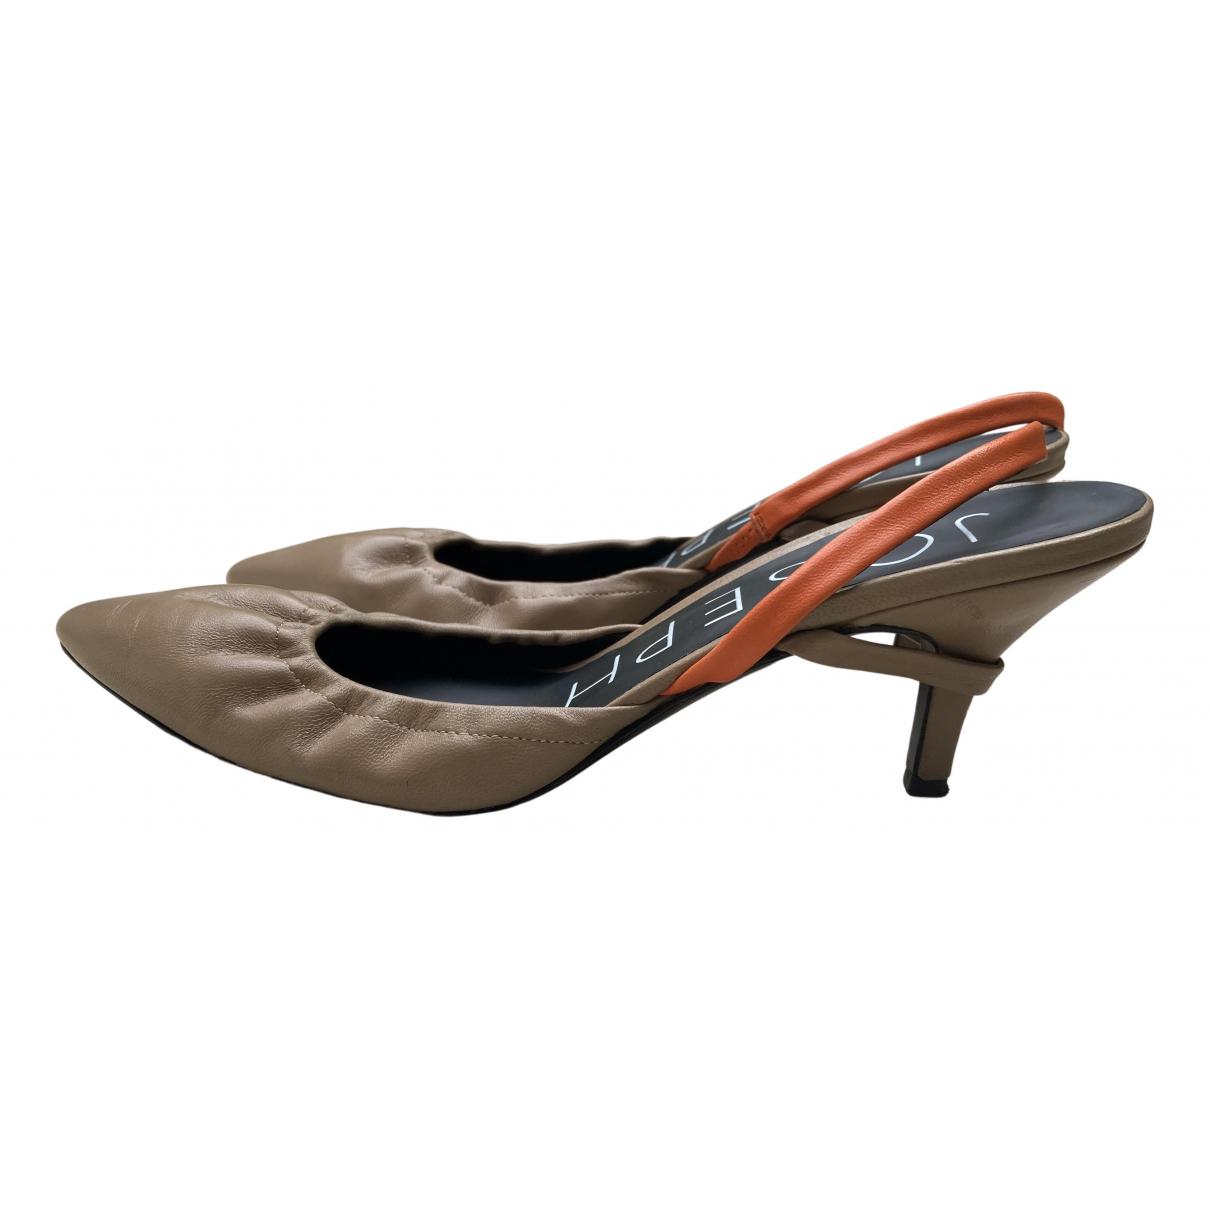 Joseph N Beige Leather Sandals for Women 37 EU